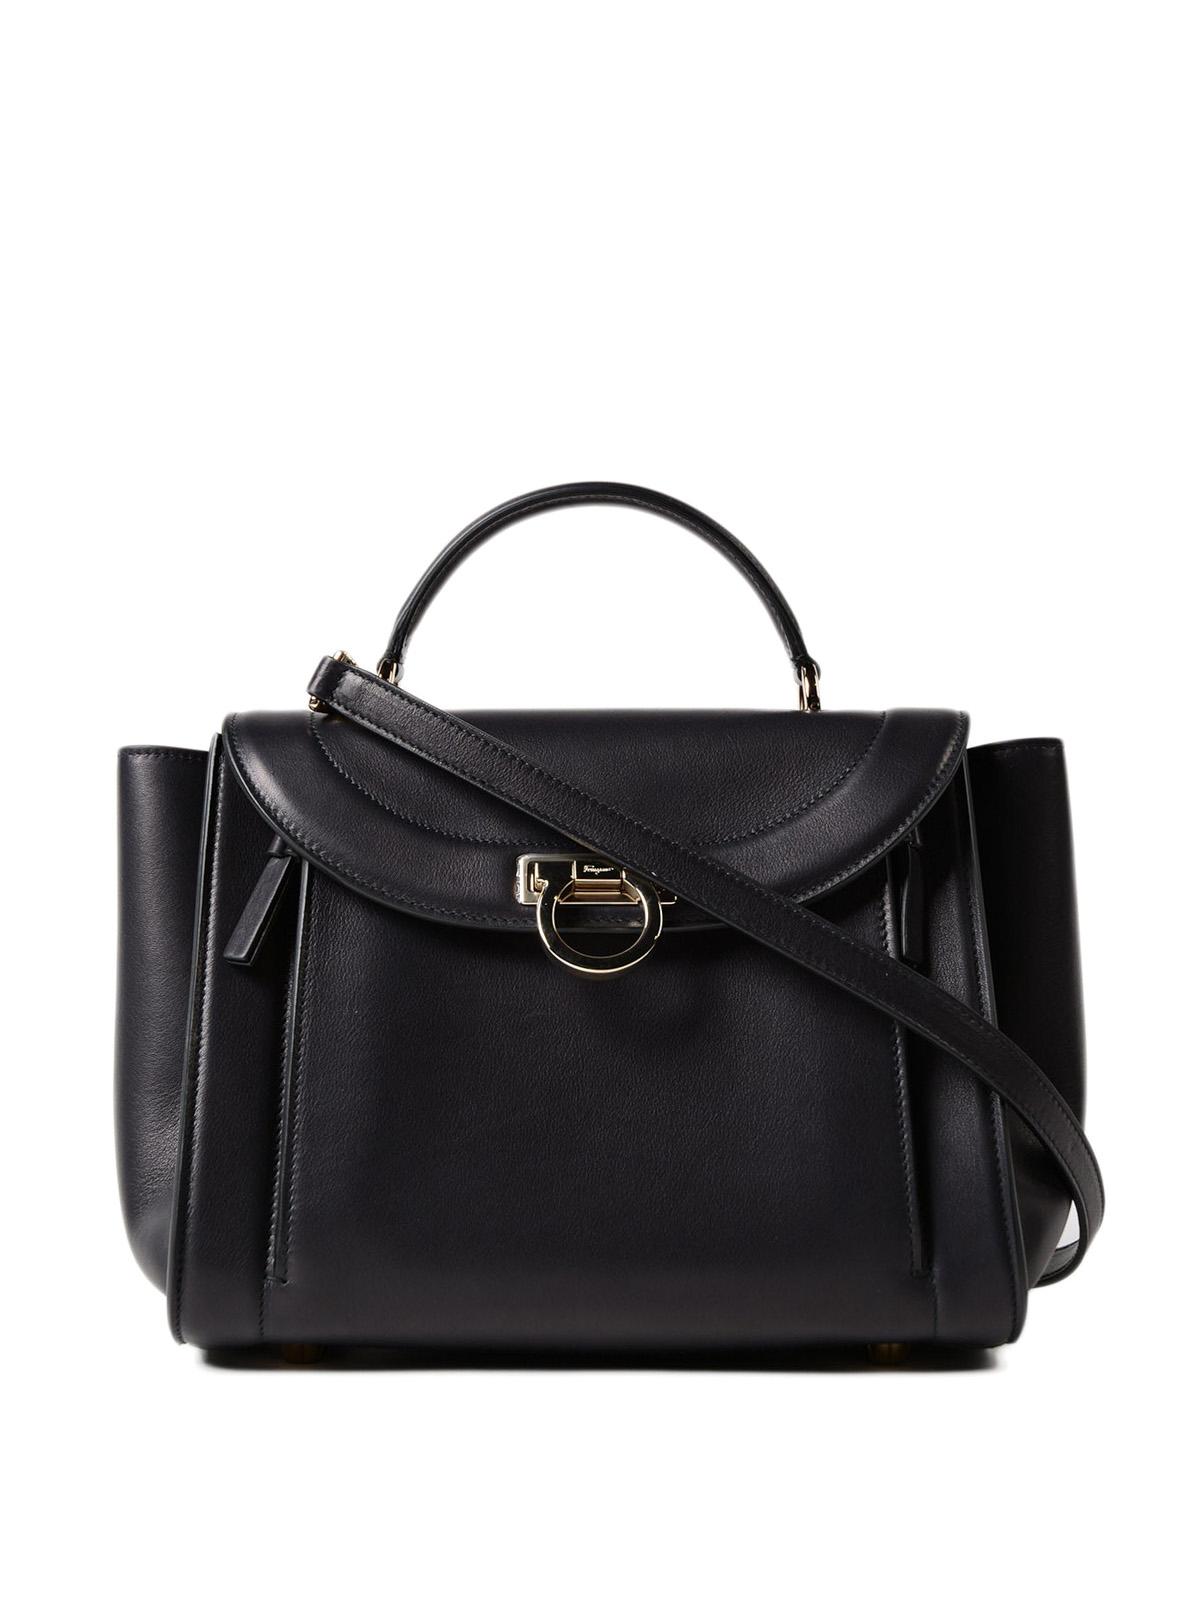 e860d6574570 ... SALVATORE FERRAGAMO bowling bags - Sofia Rainbow small handbag  competitive price 0dda2 70ca6 ...